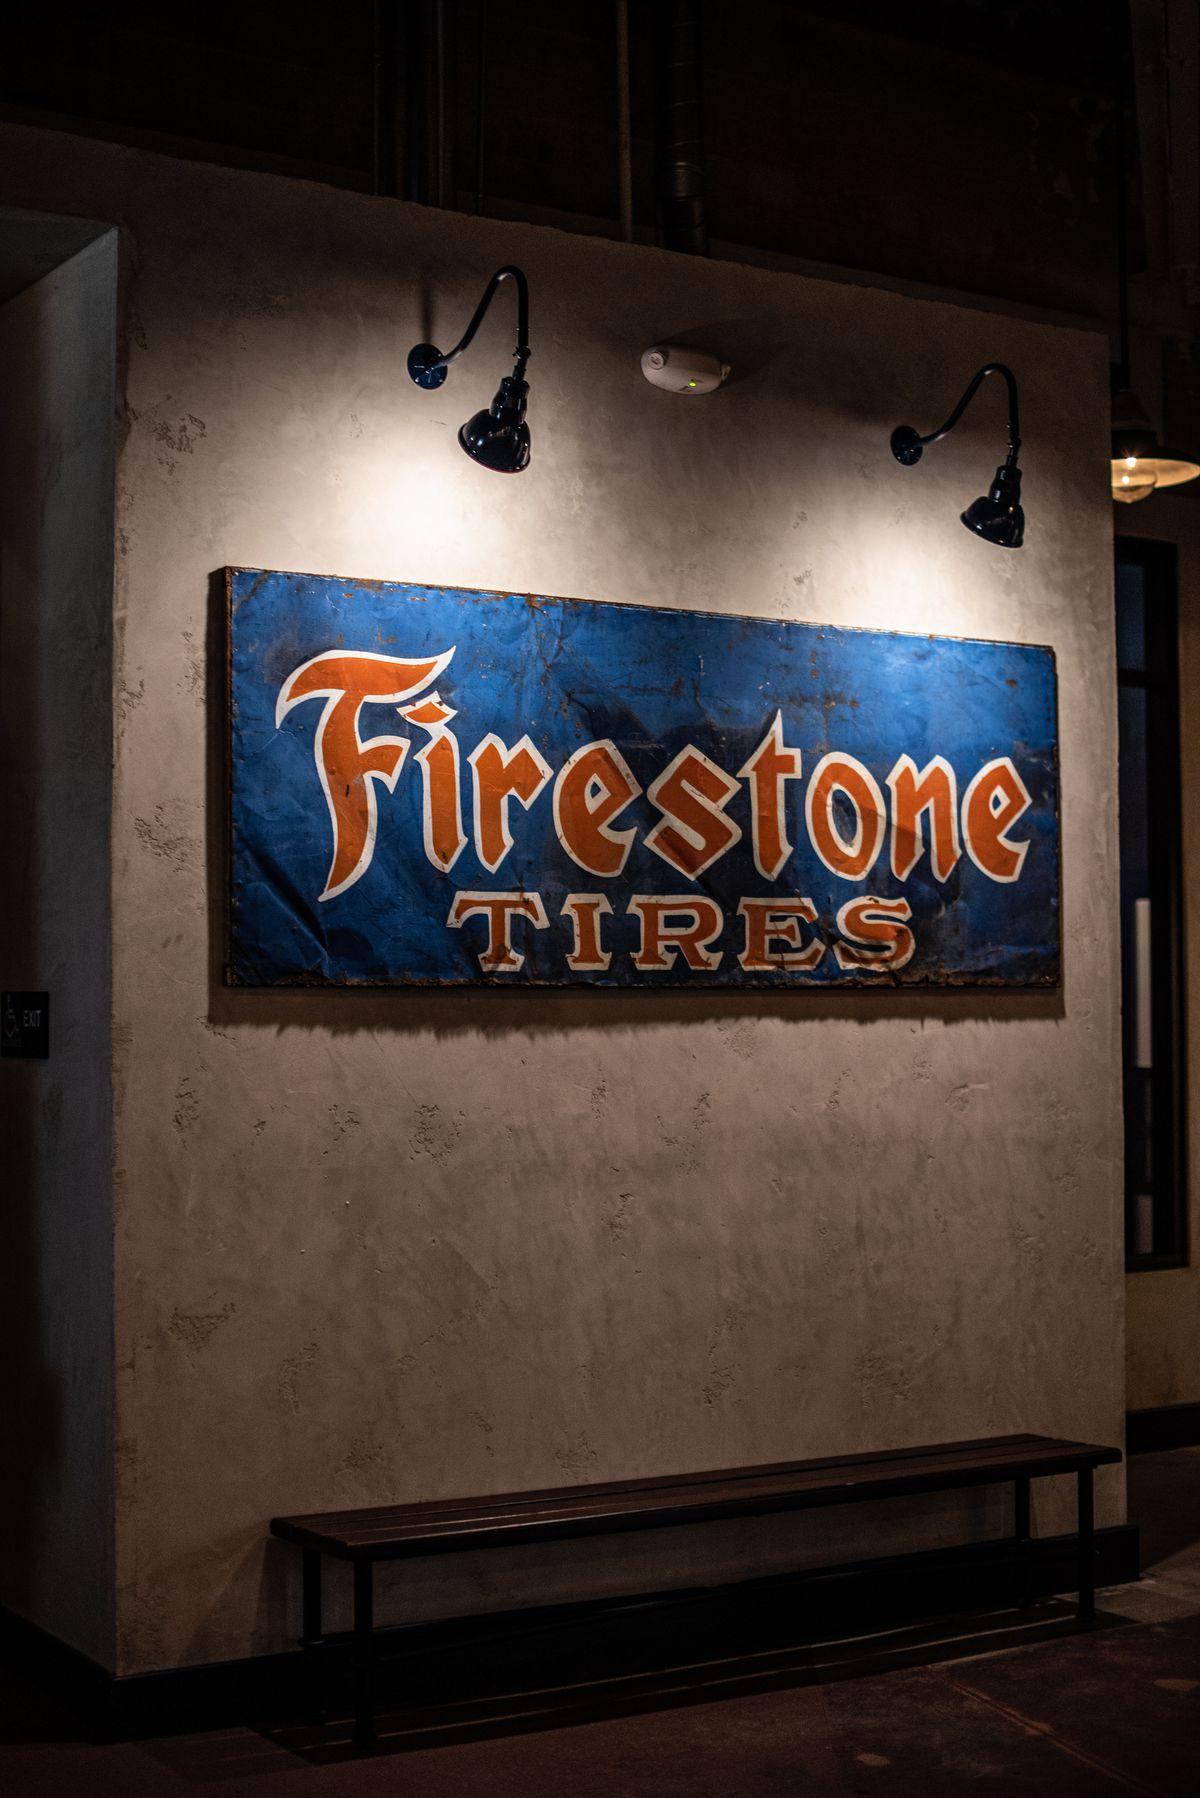 A dark blue banner reads Firestone Tires under low light.